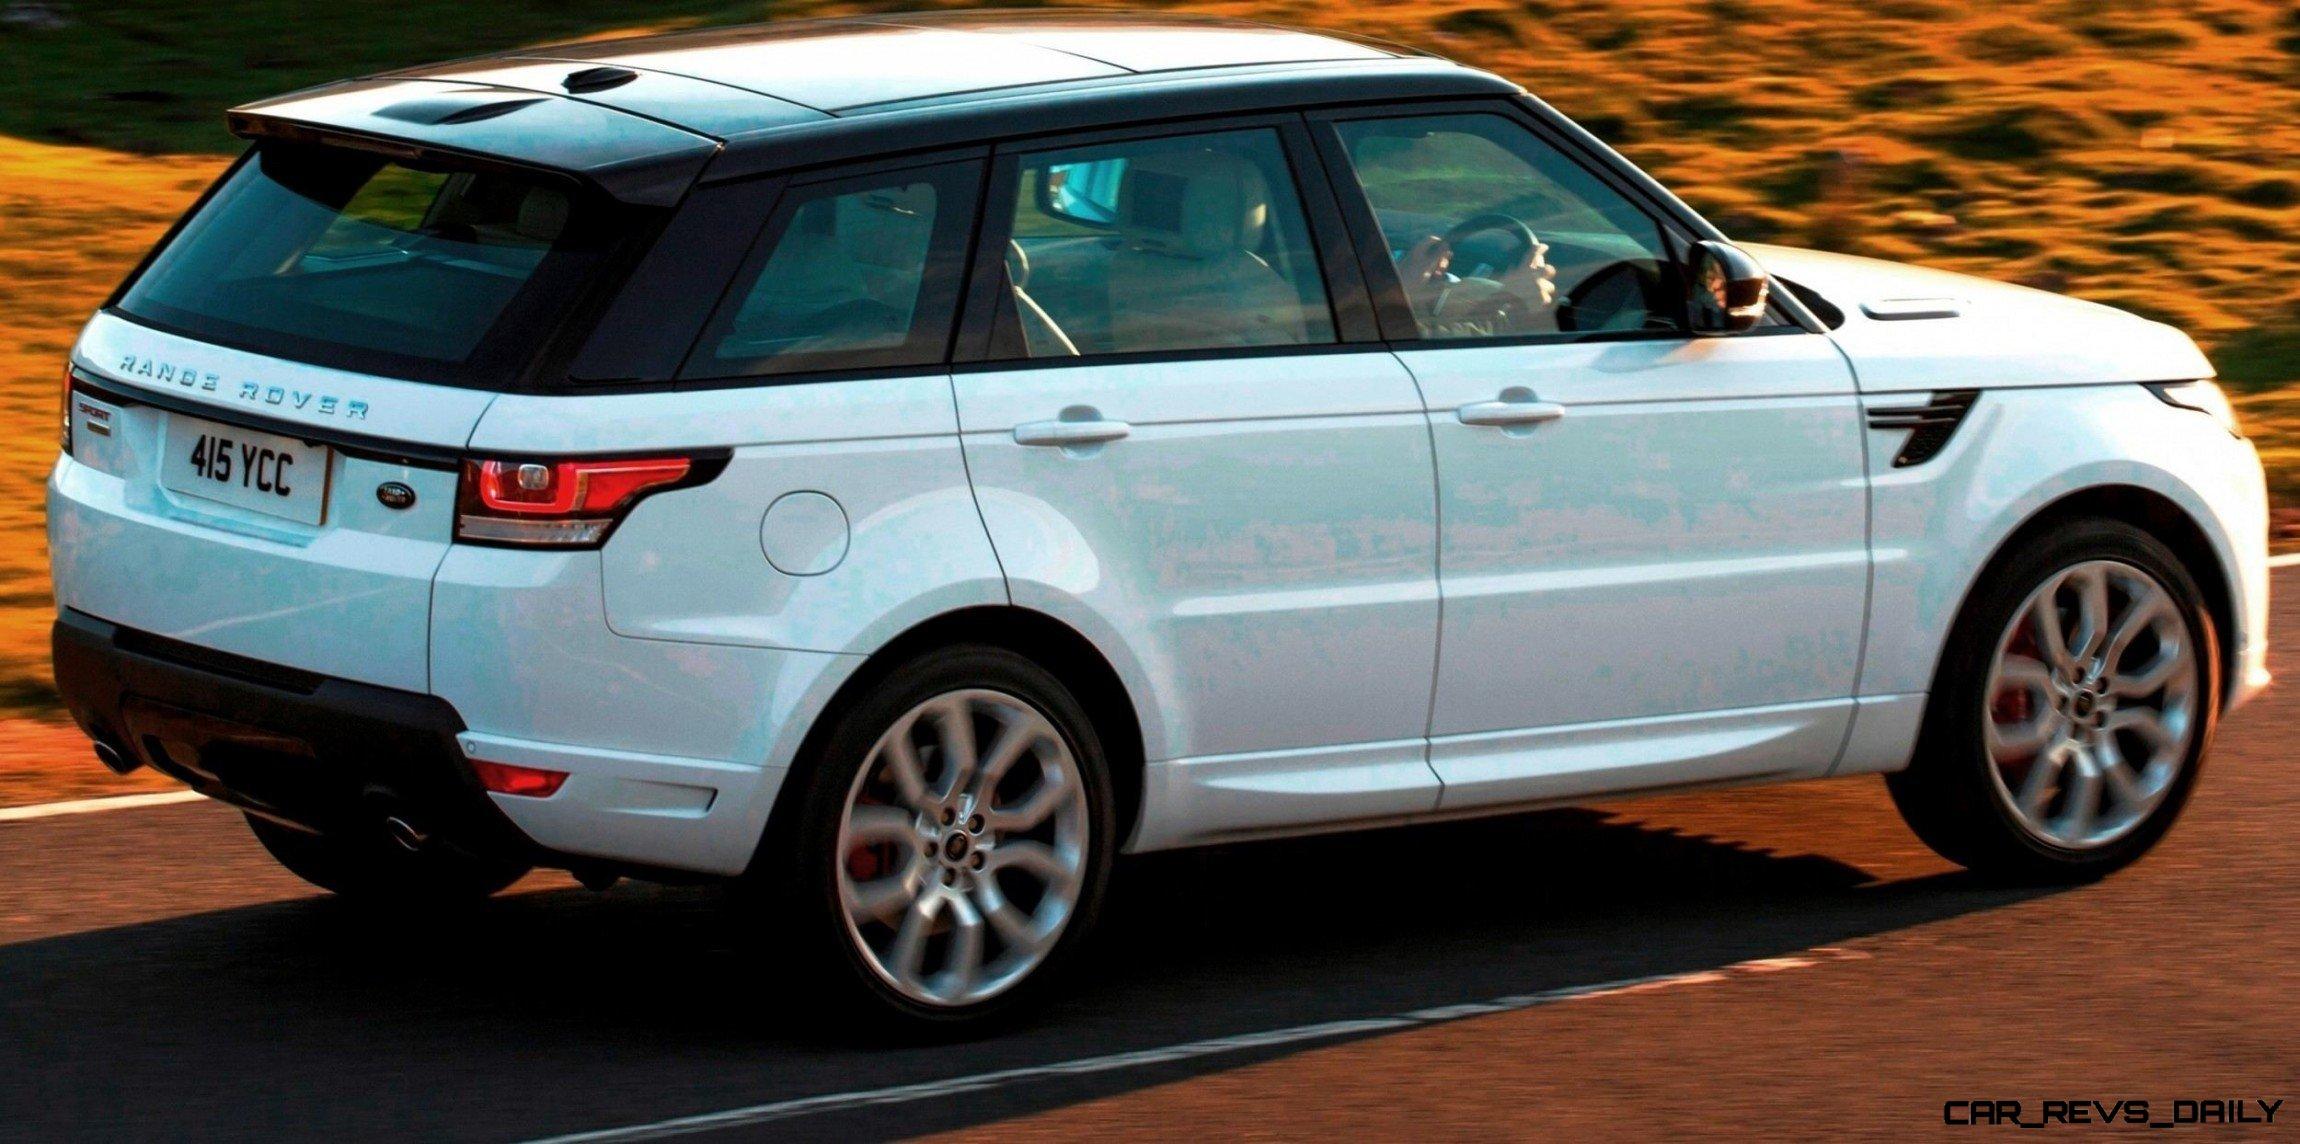 Fun Car Art 2014 Range Rover Sport Autobiography in Fuji White